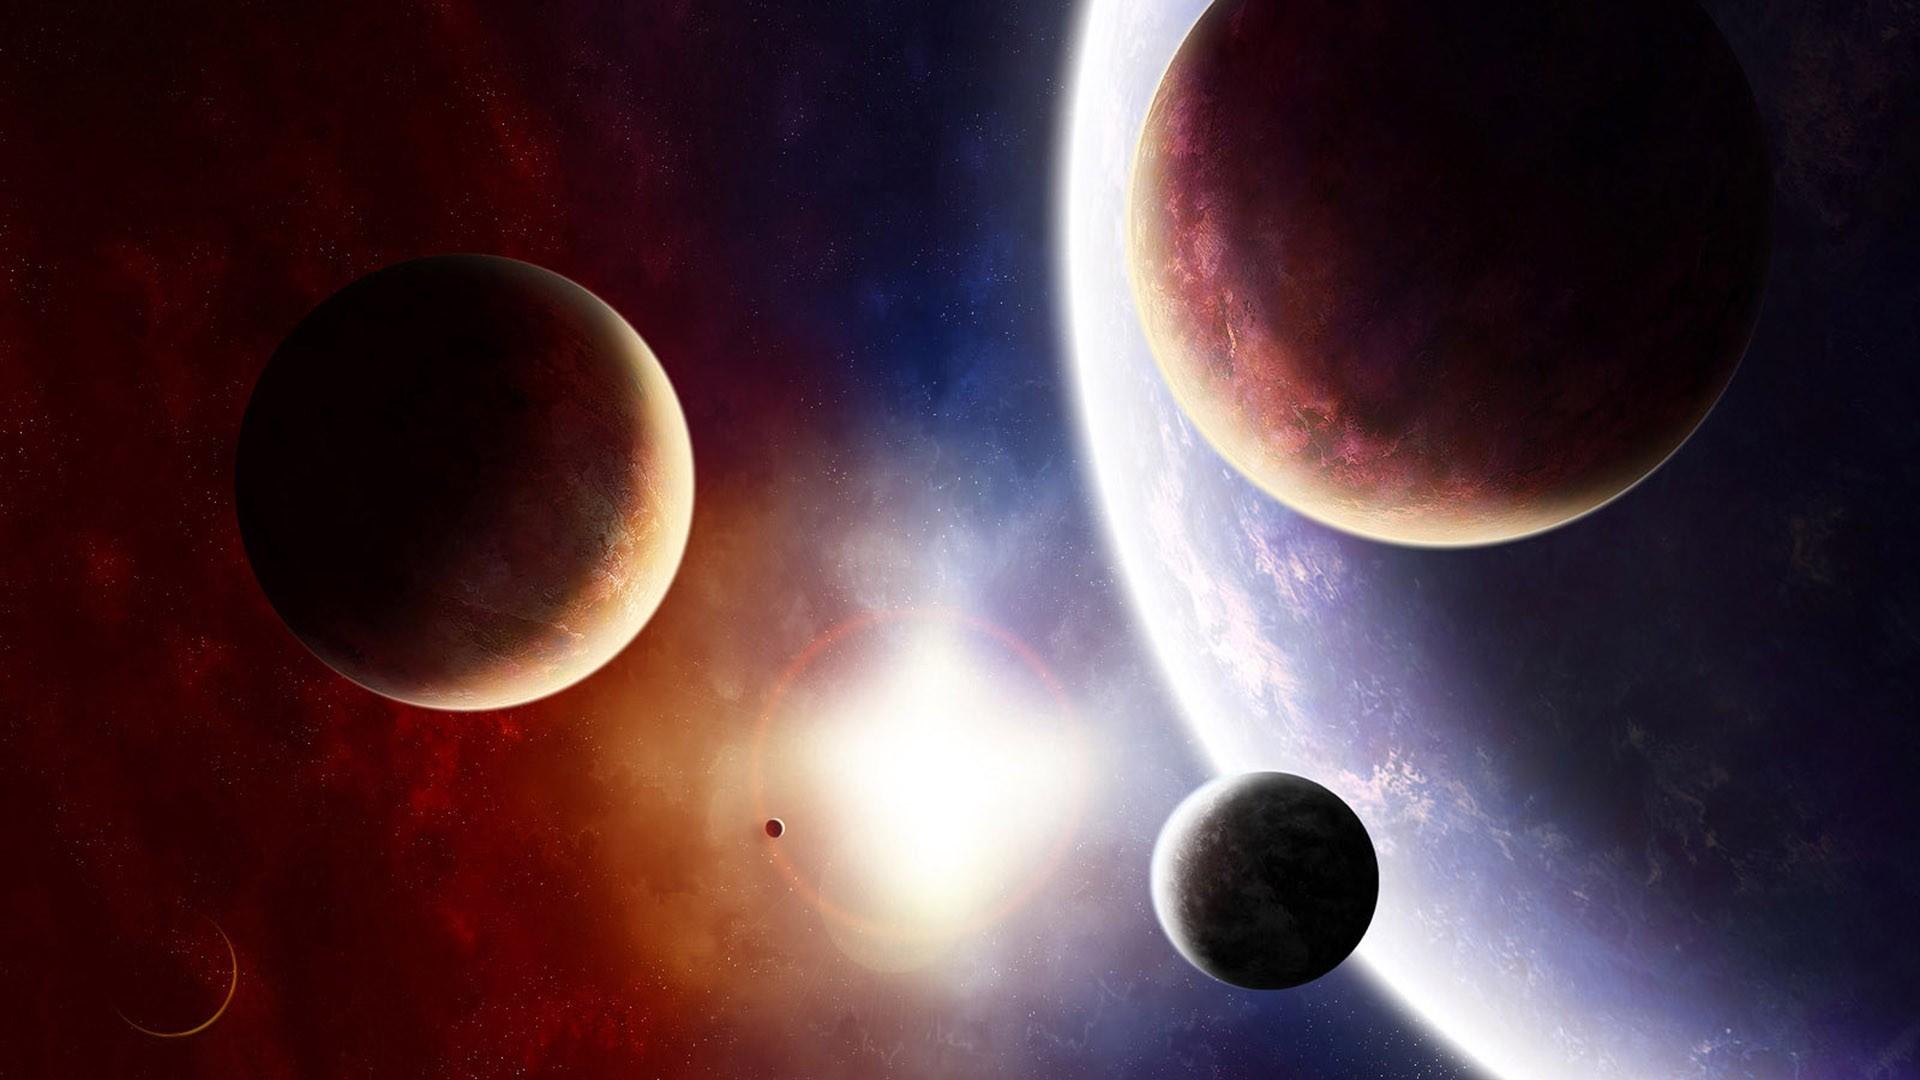 [76+] Solar System Wallpapers on WallpaperSafari